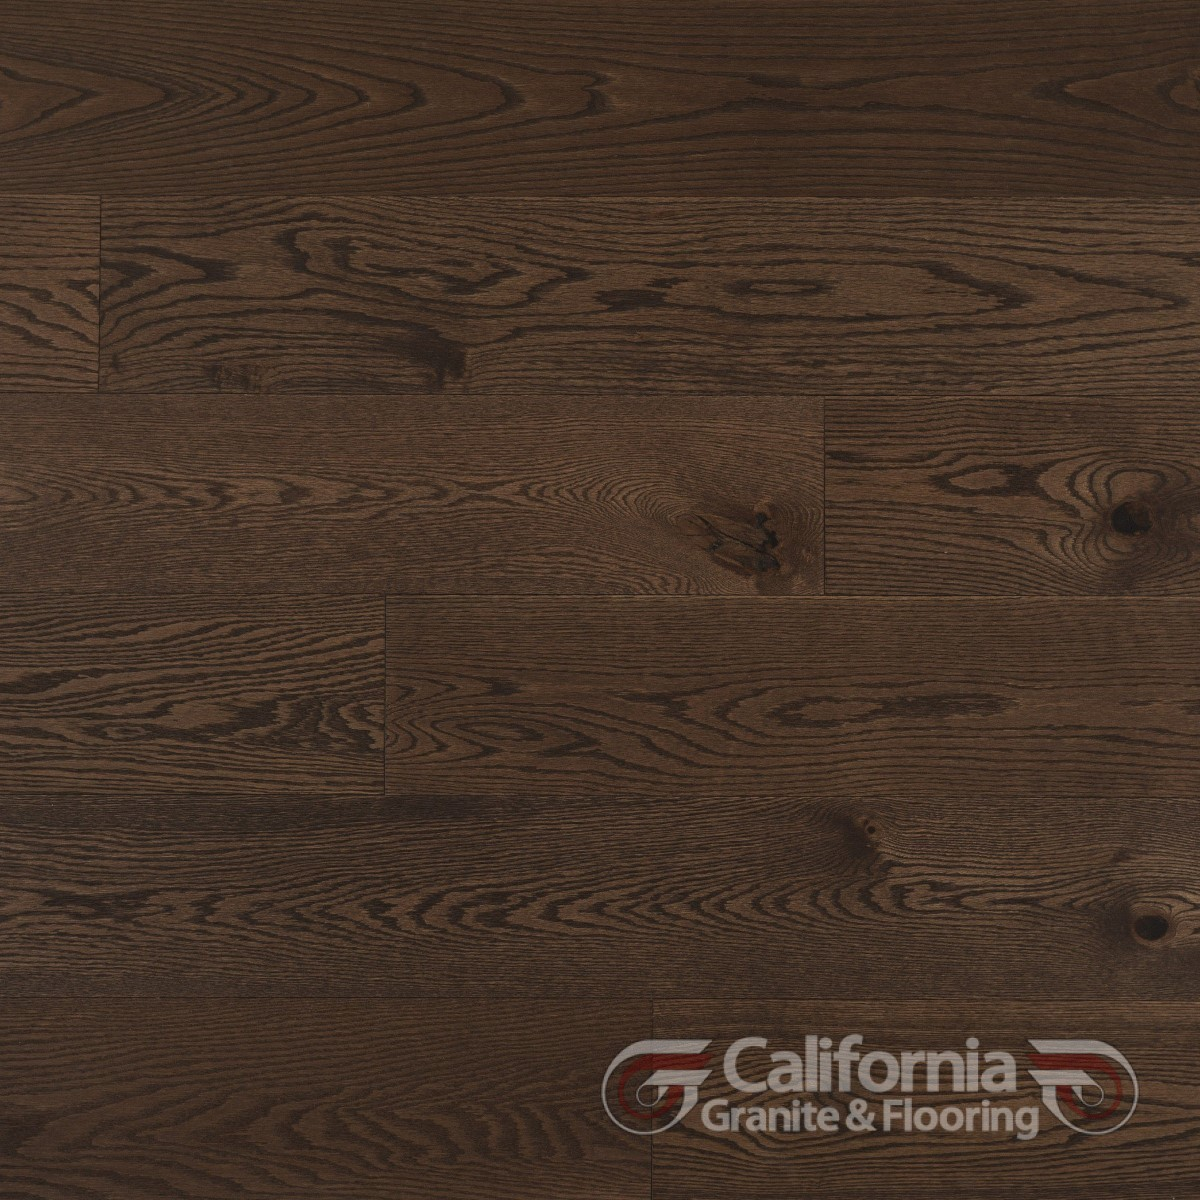 hardwood-flooring-red-oak-nightfall-character-brushed-2